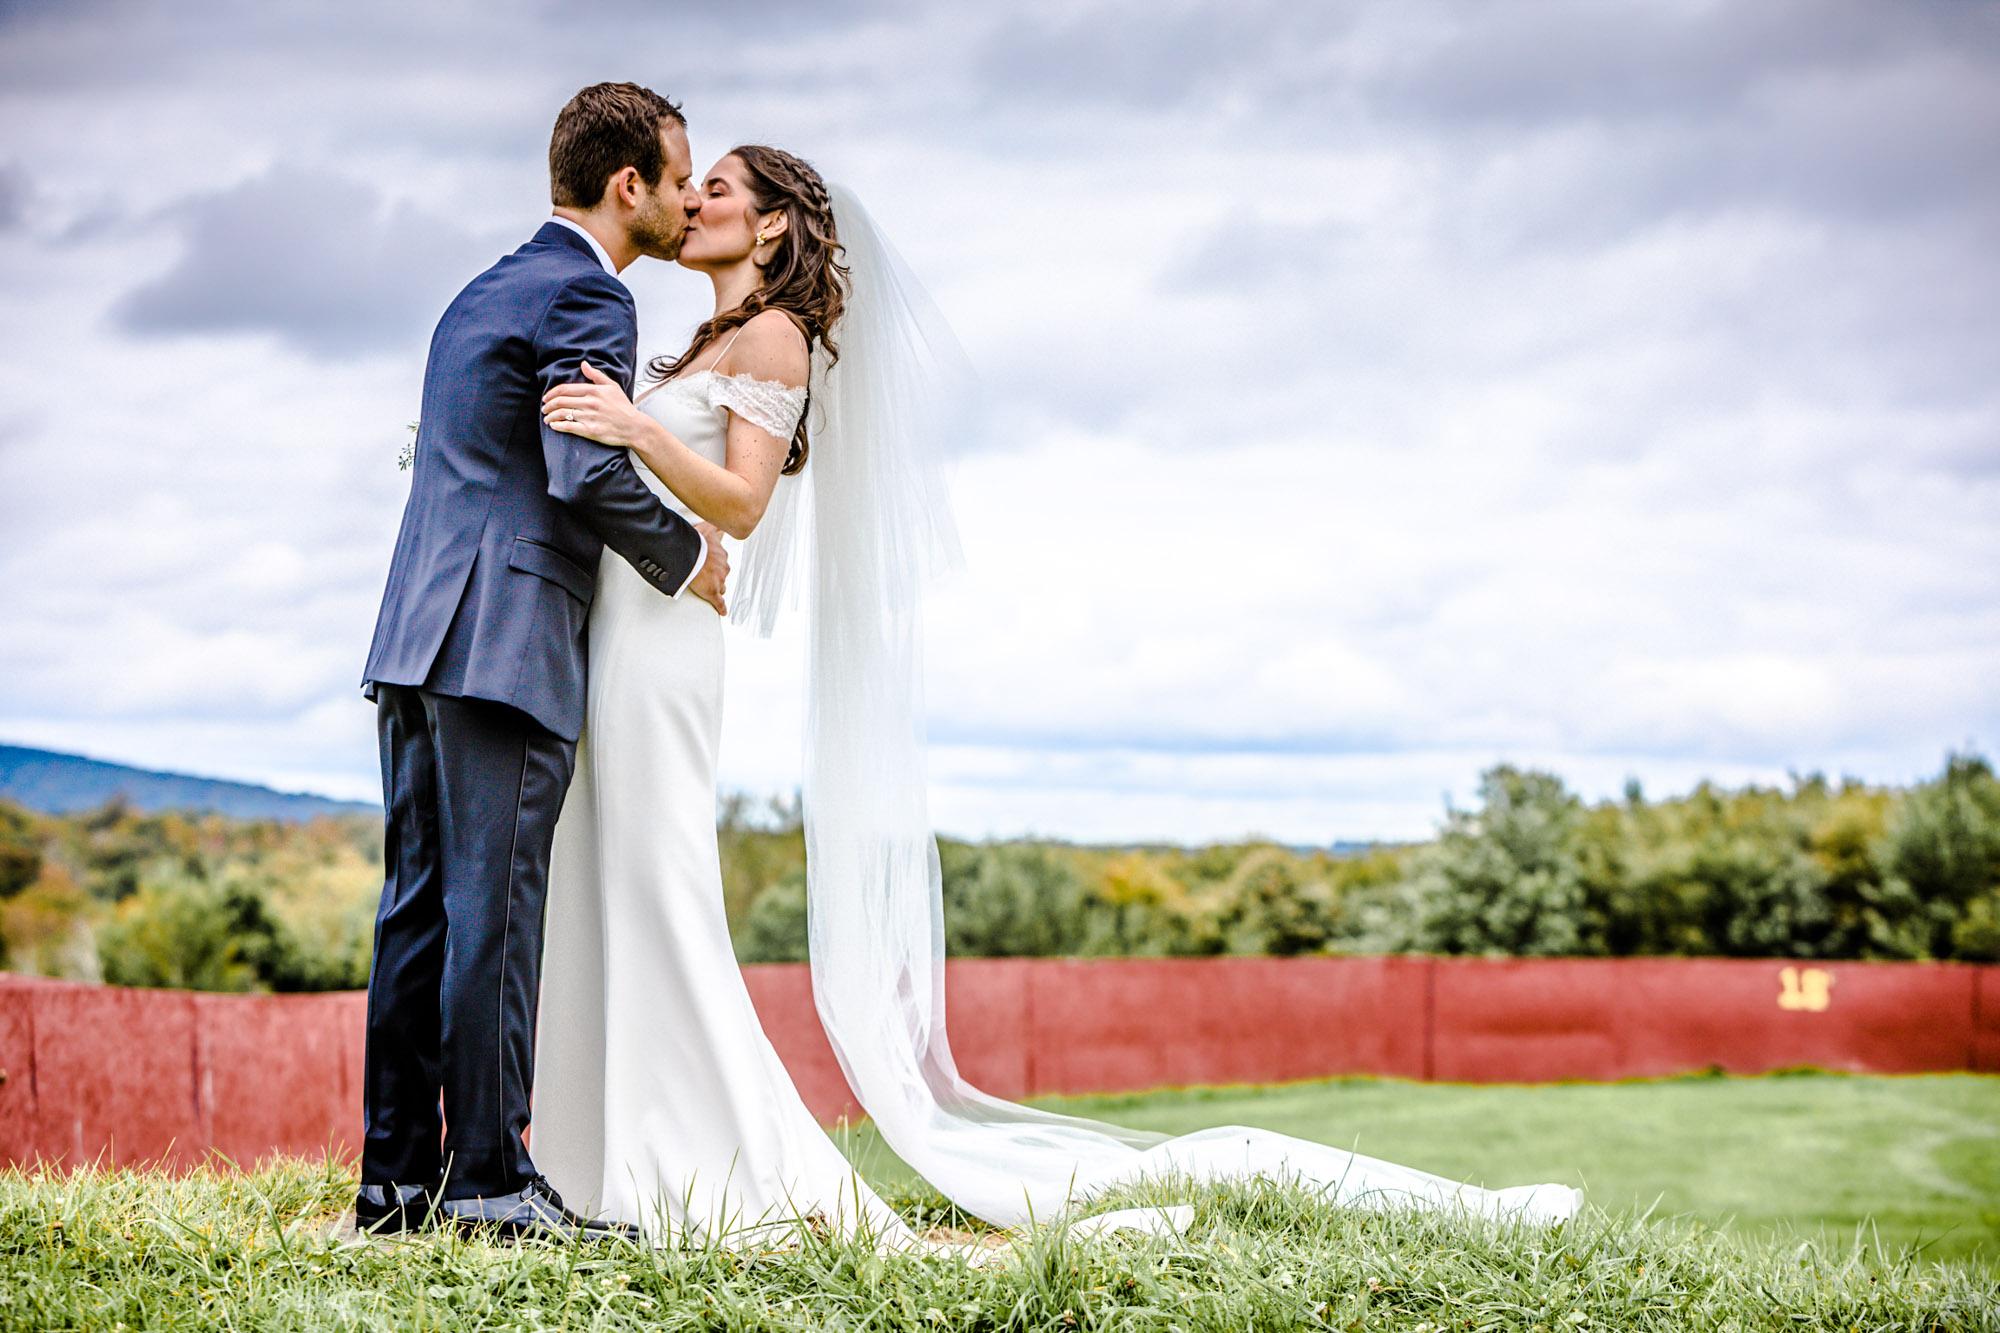 scranton_wedding_photographer_lettieri_pa (14 of 34).jpg